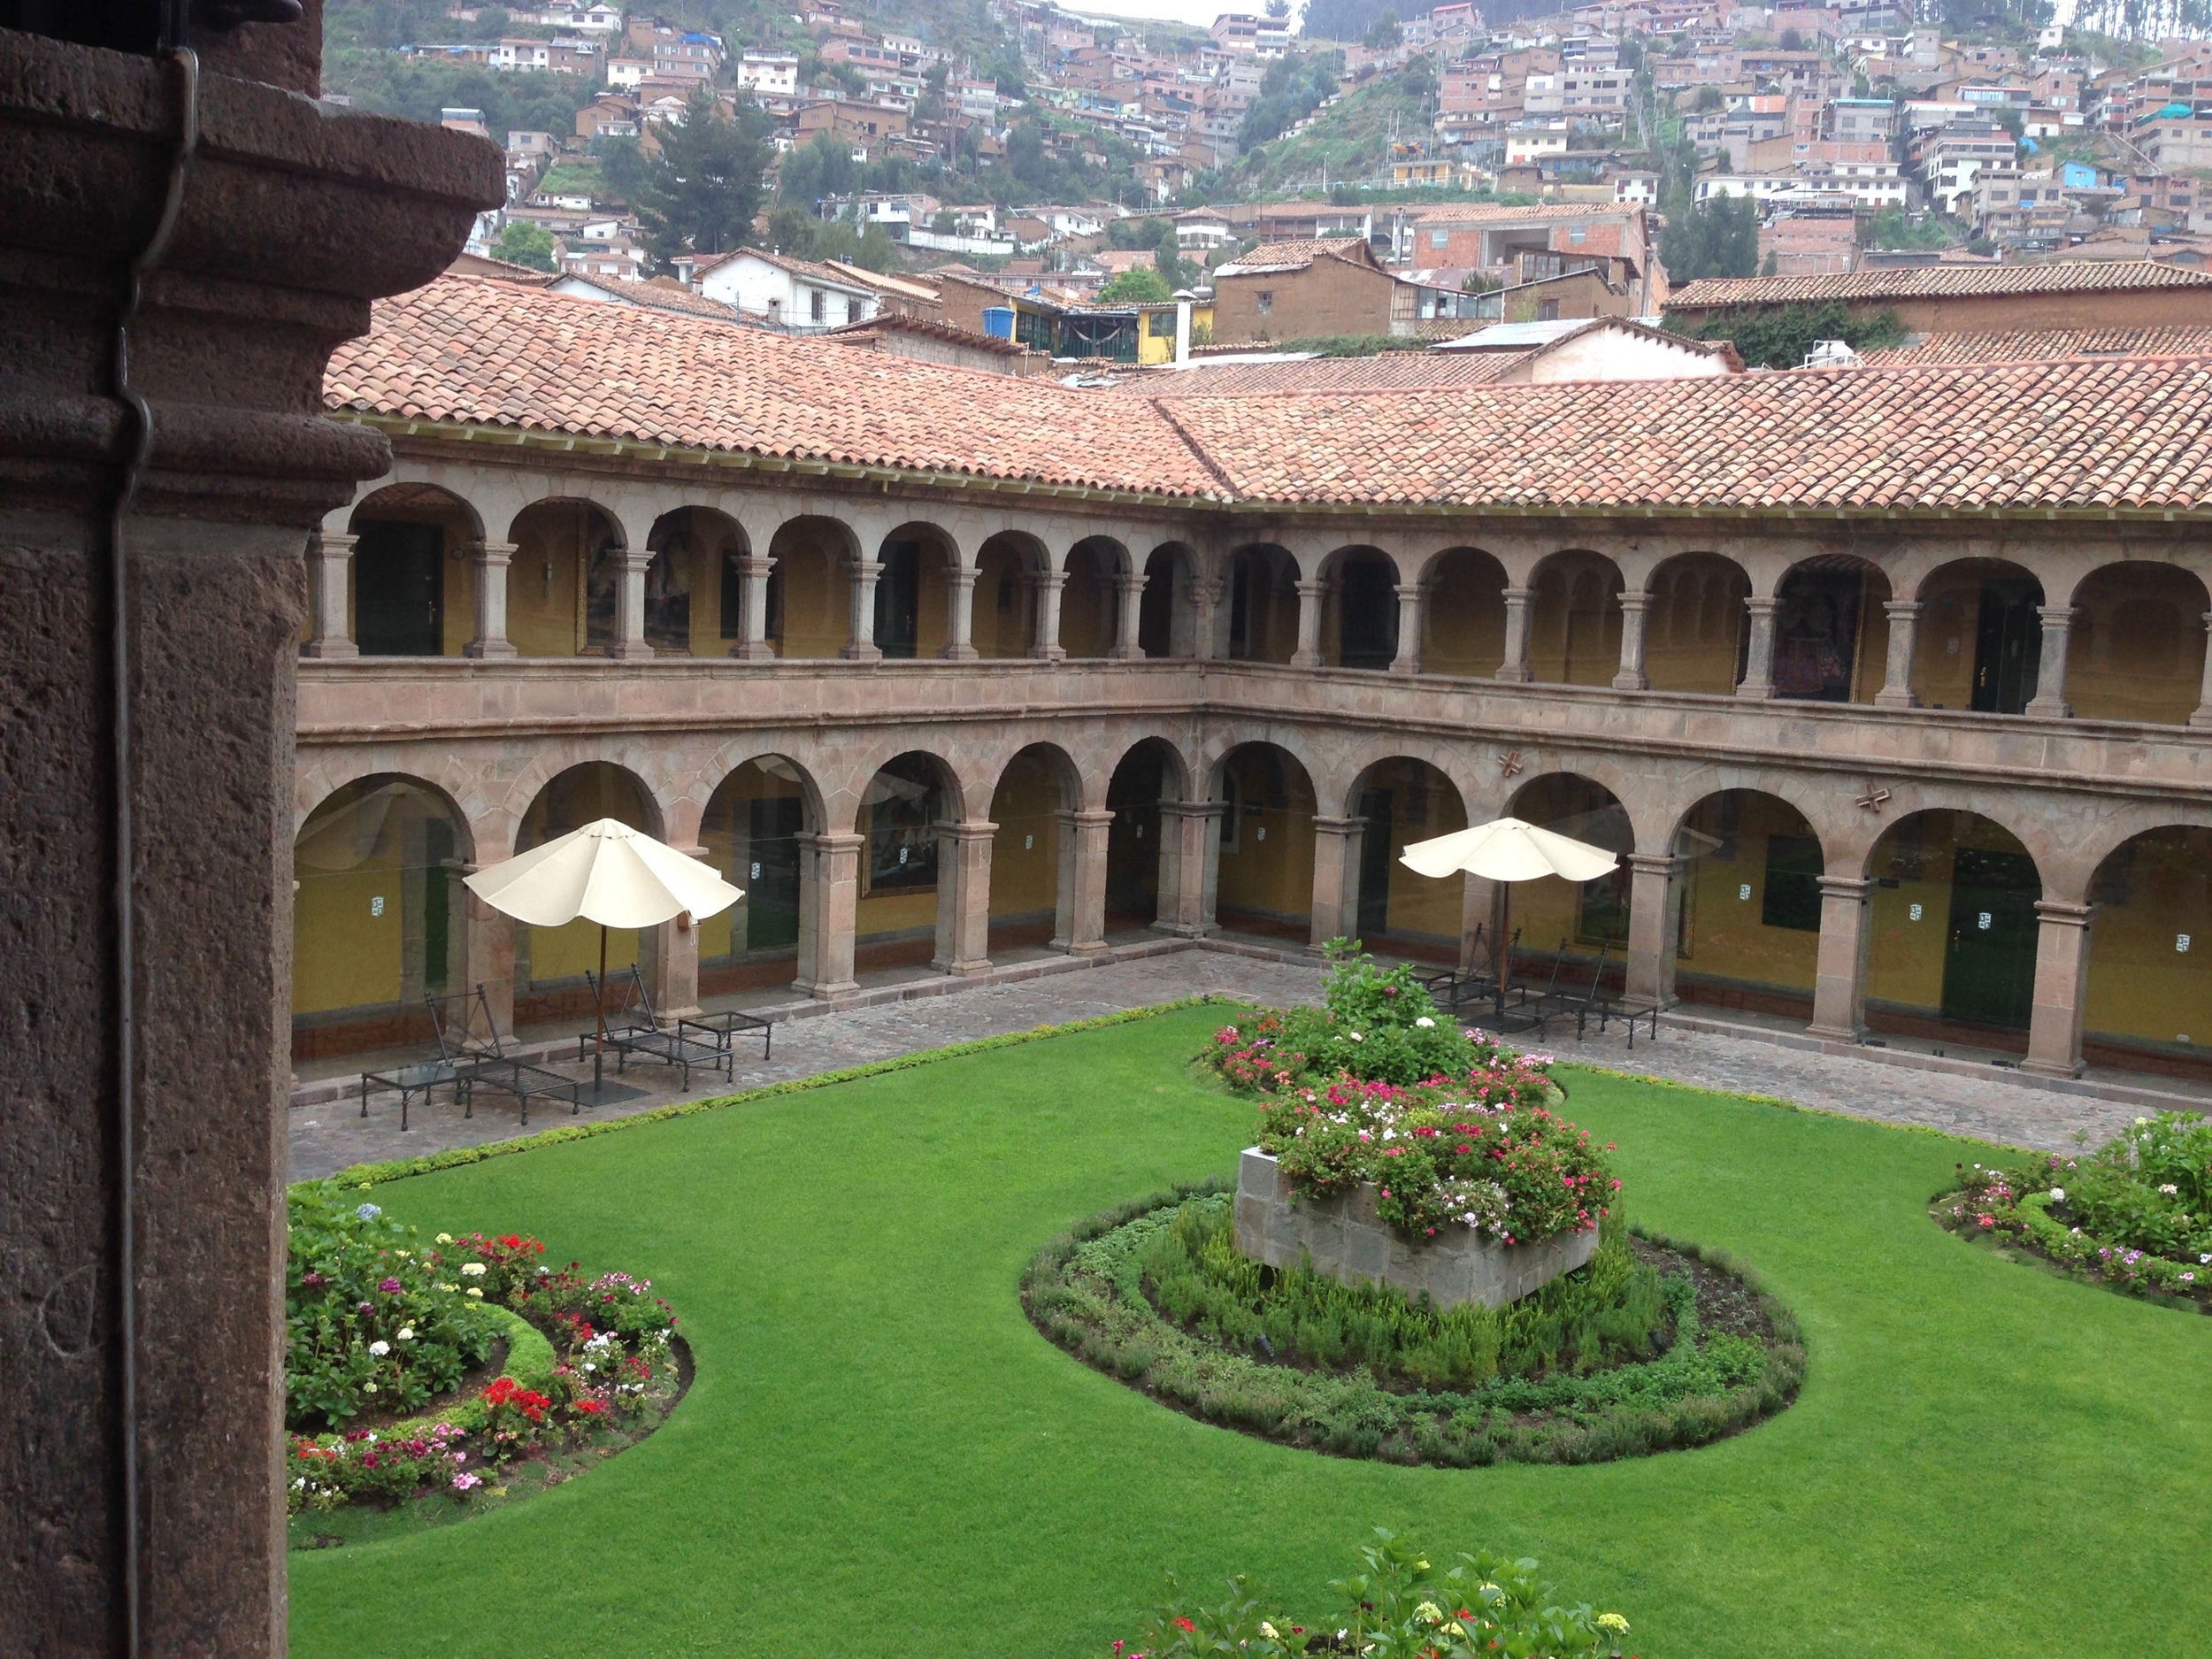 Hotel Monasterio Courtyard